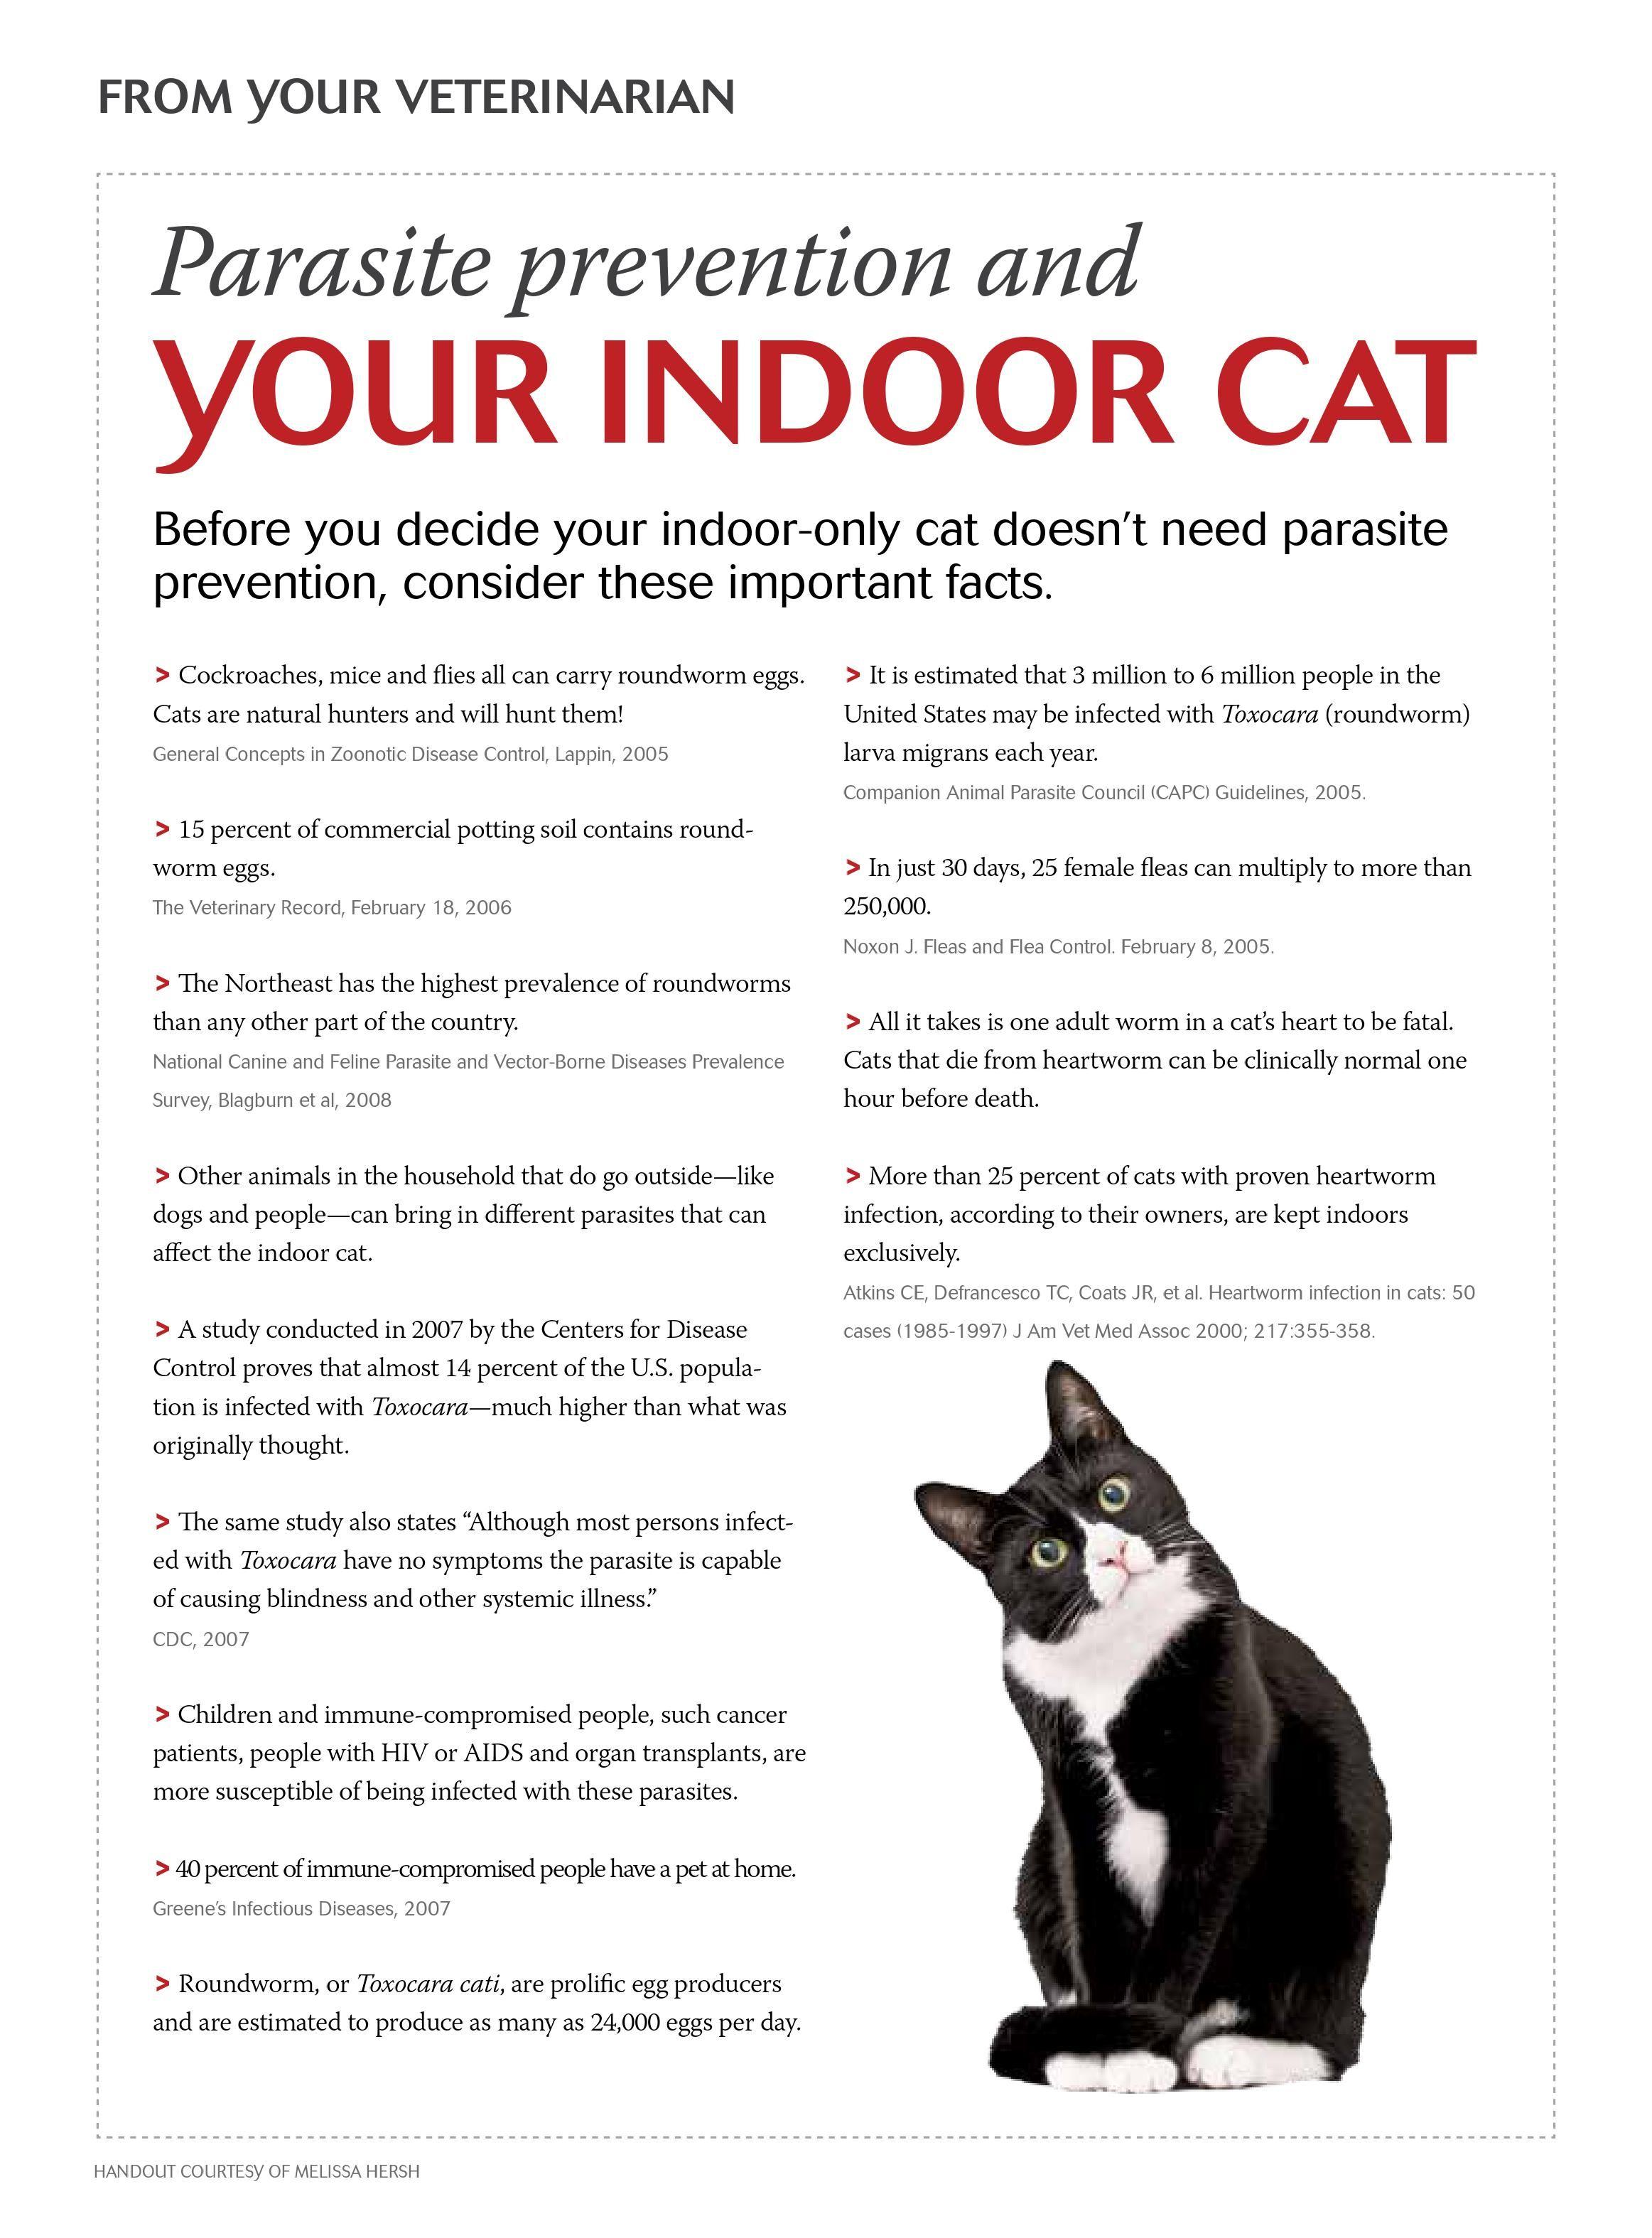 Santa Rosa Ca Animal Hospital Petcare Veterinary Hospital Santa Rosa Ca Cat Care Cats Cat Health